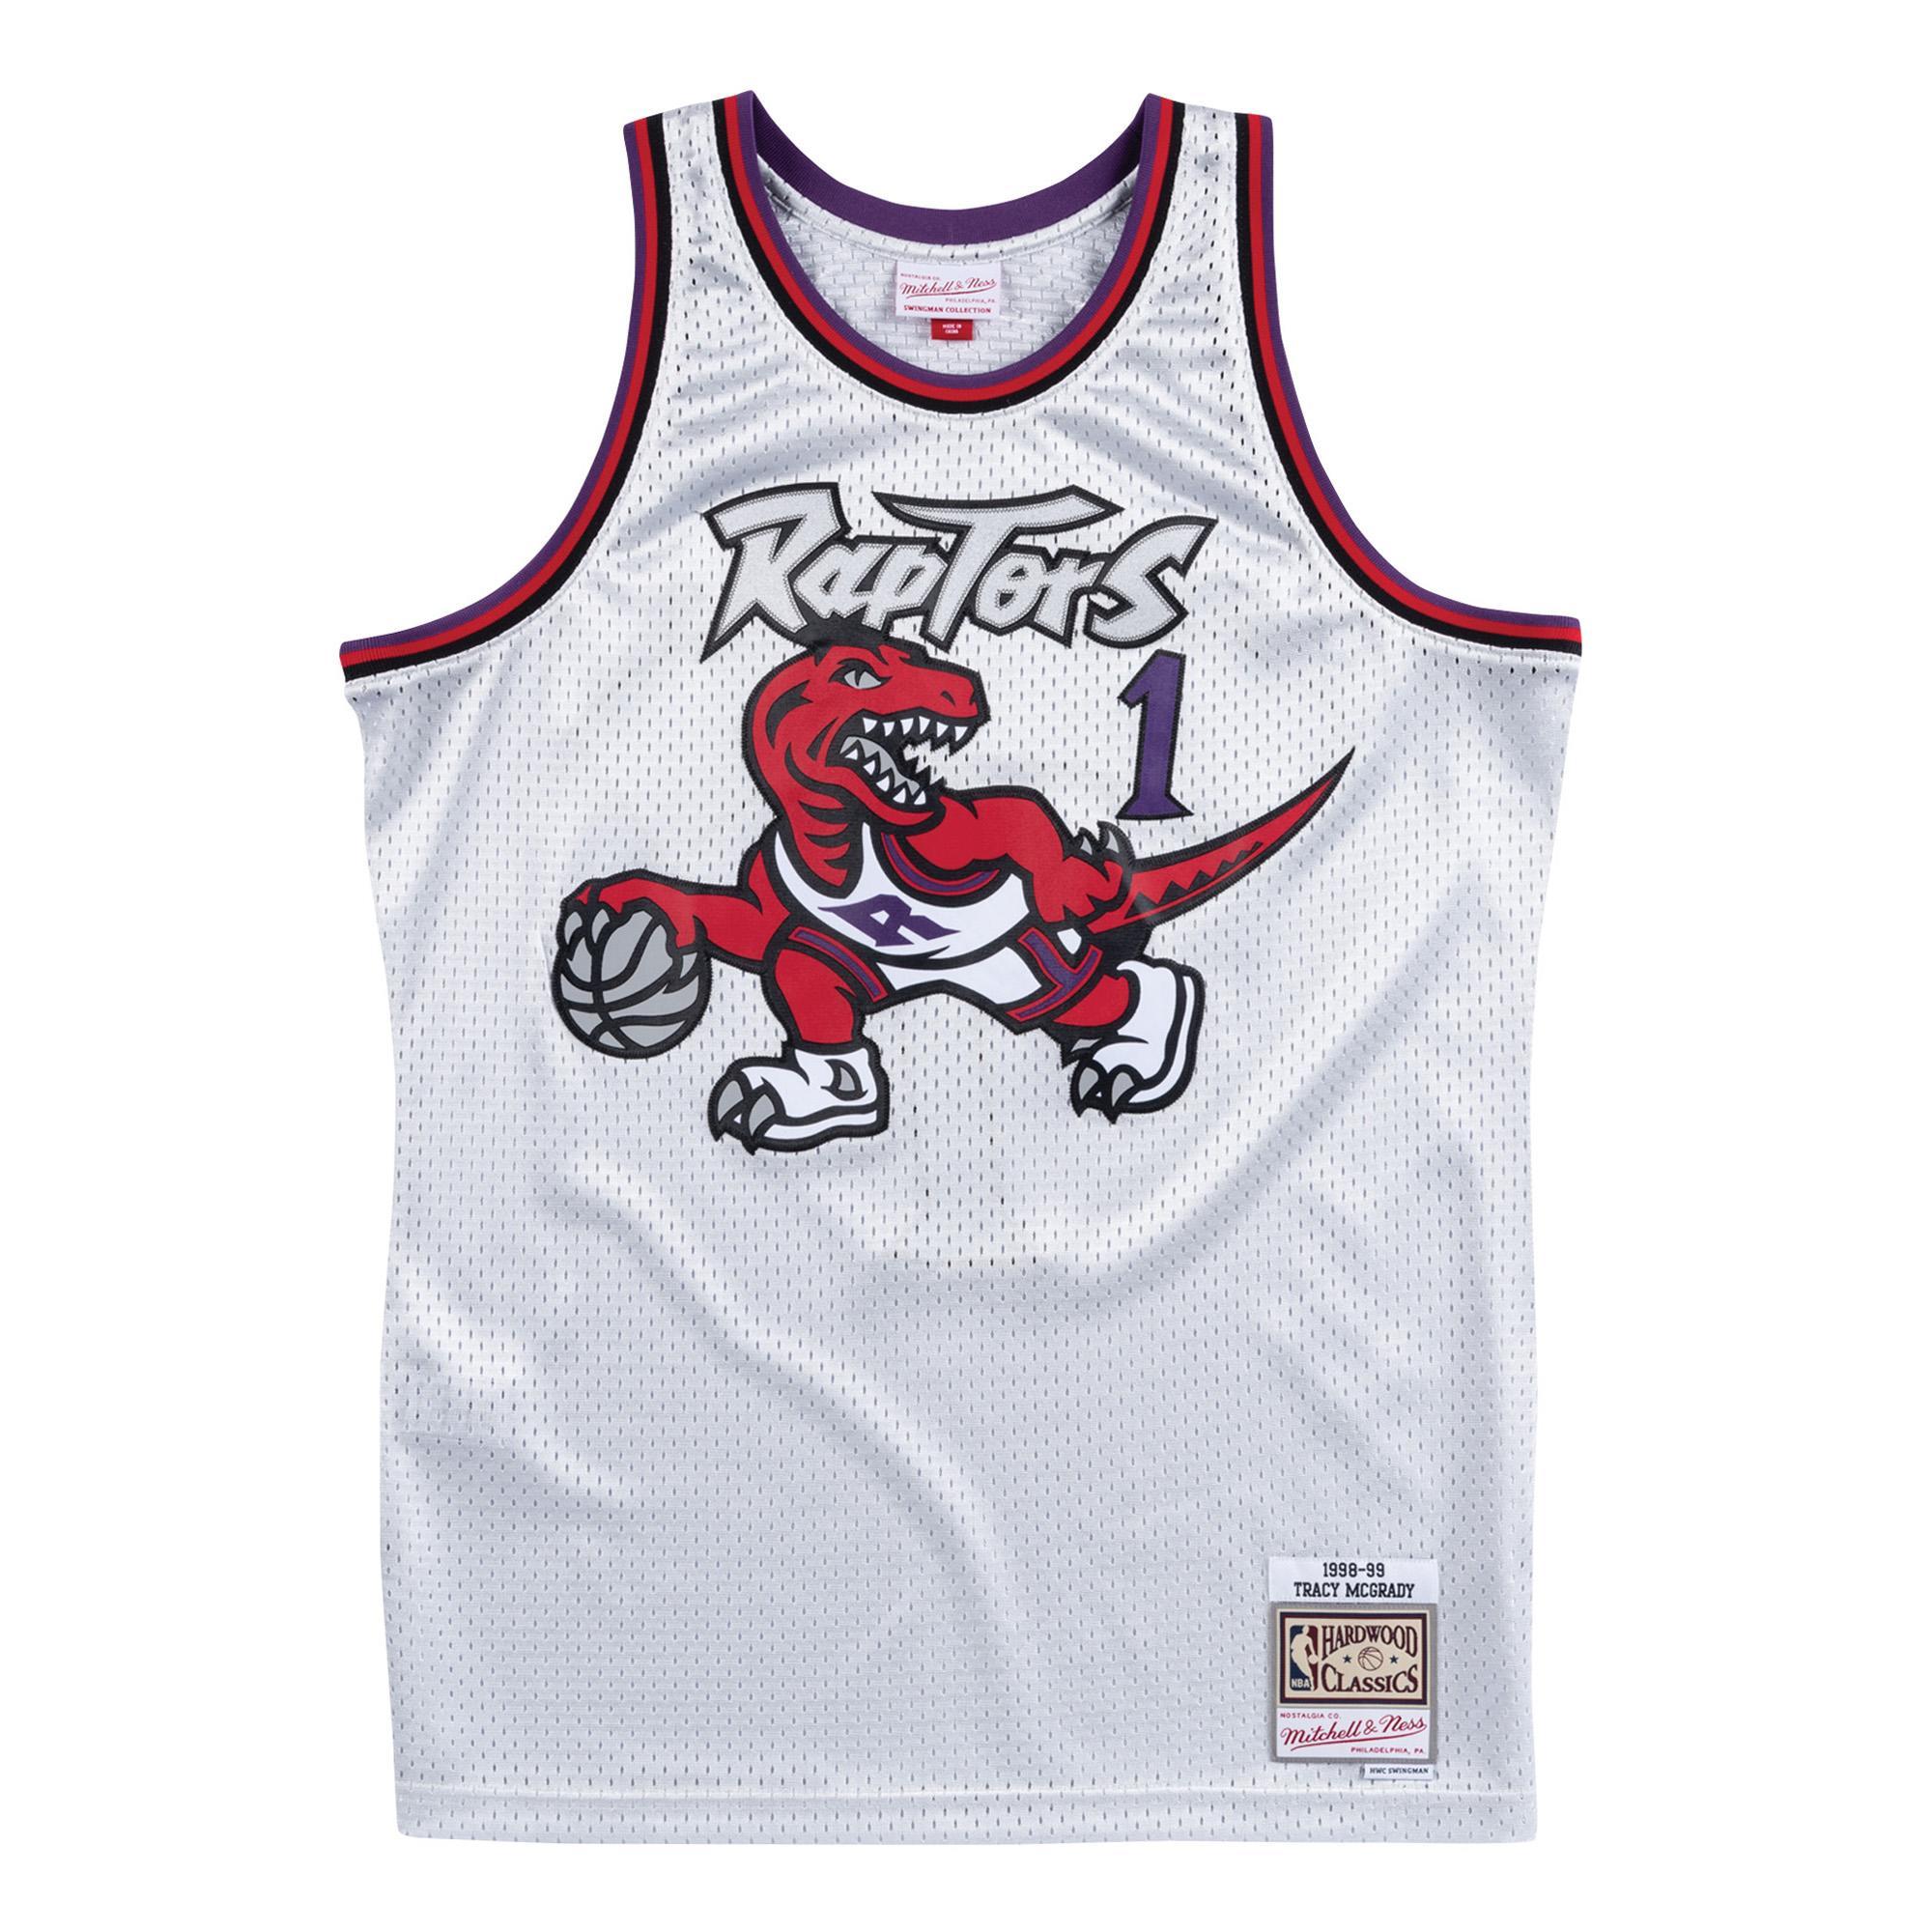 92981586629 Mitchell & Ness | Toronto Raptors Platinum Swingman Jersey Tracy Mcgrady